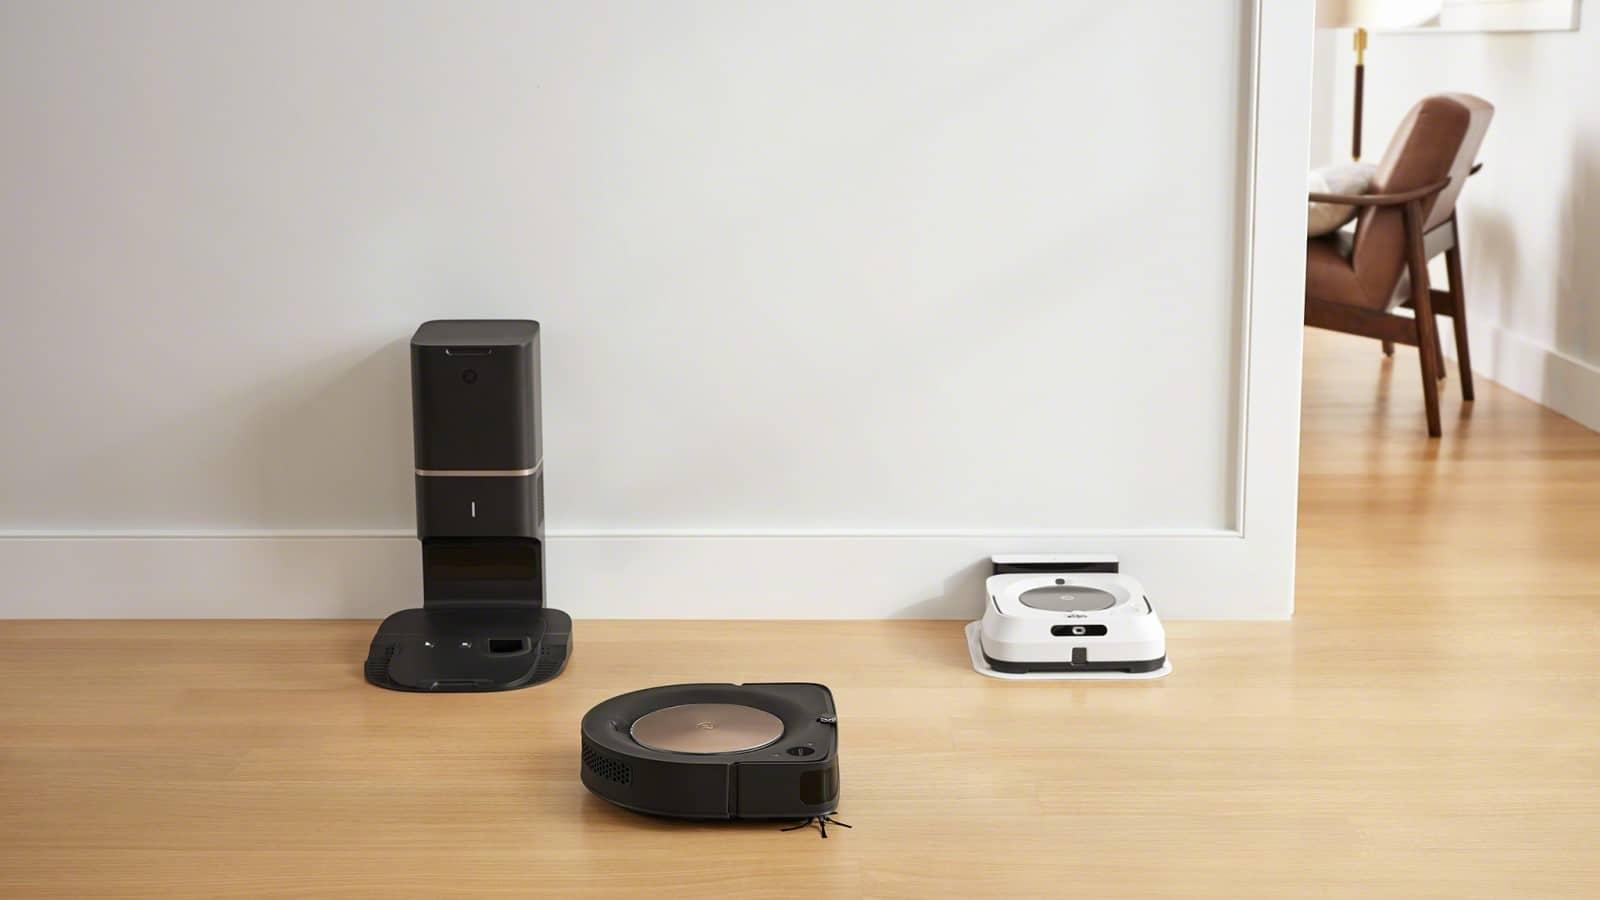 irobot roomba s9 plus robot vacuum and braava m6 robot mop